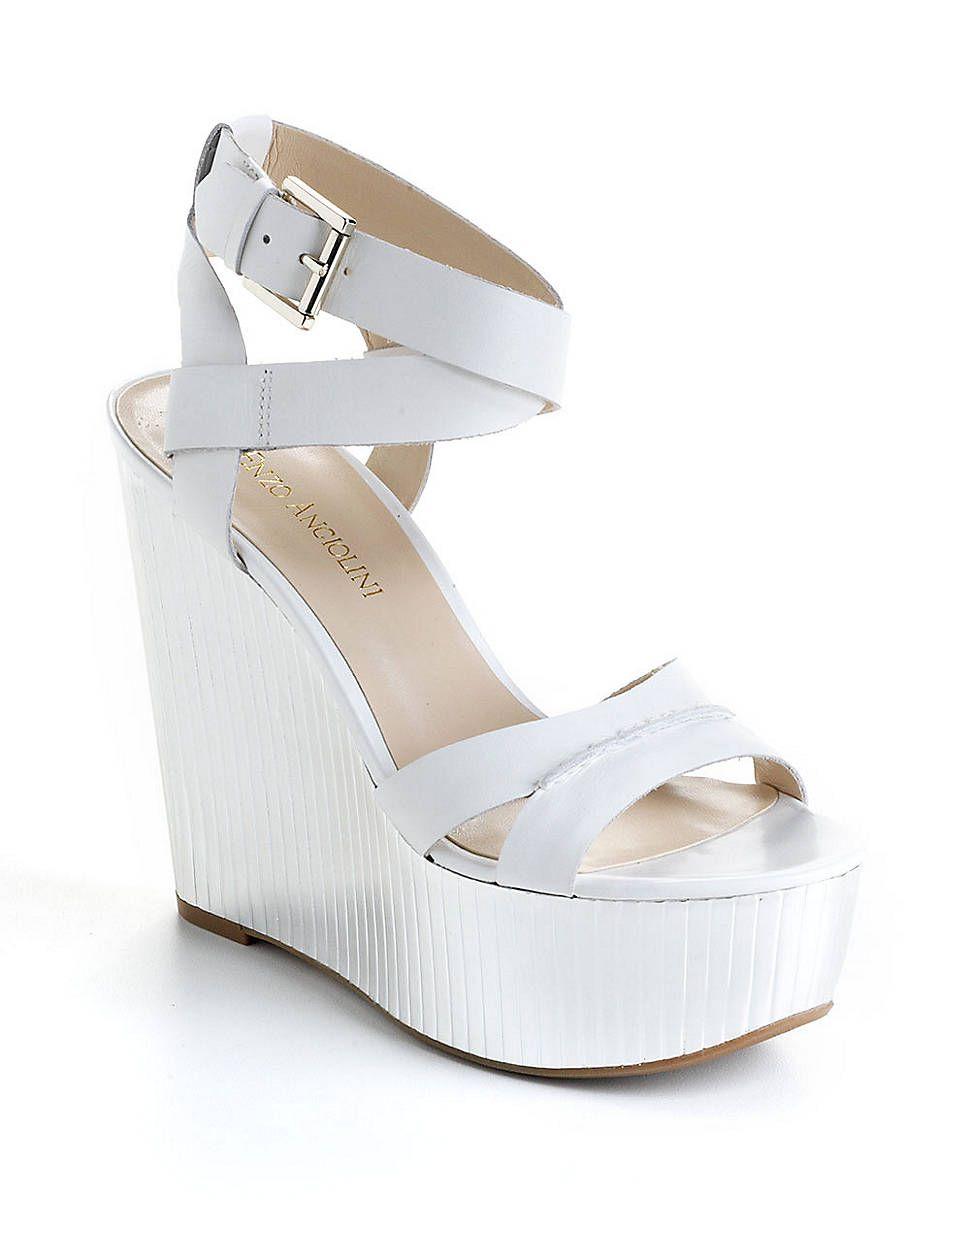 428505c209b Zamaz Leather Platform Wedge Sandals